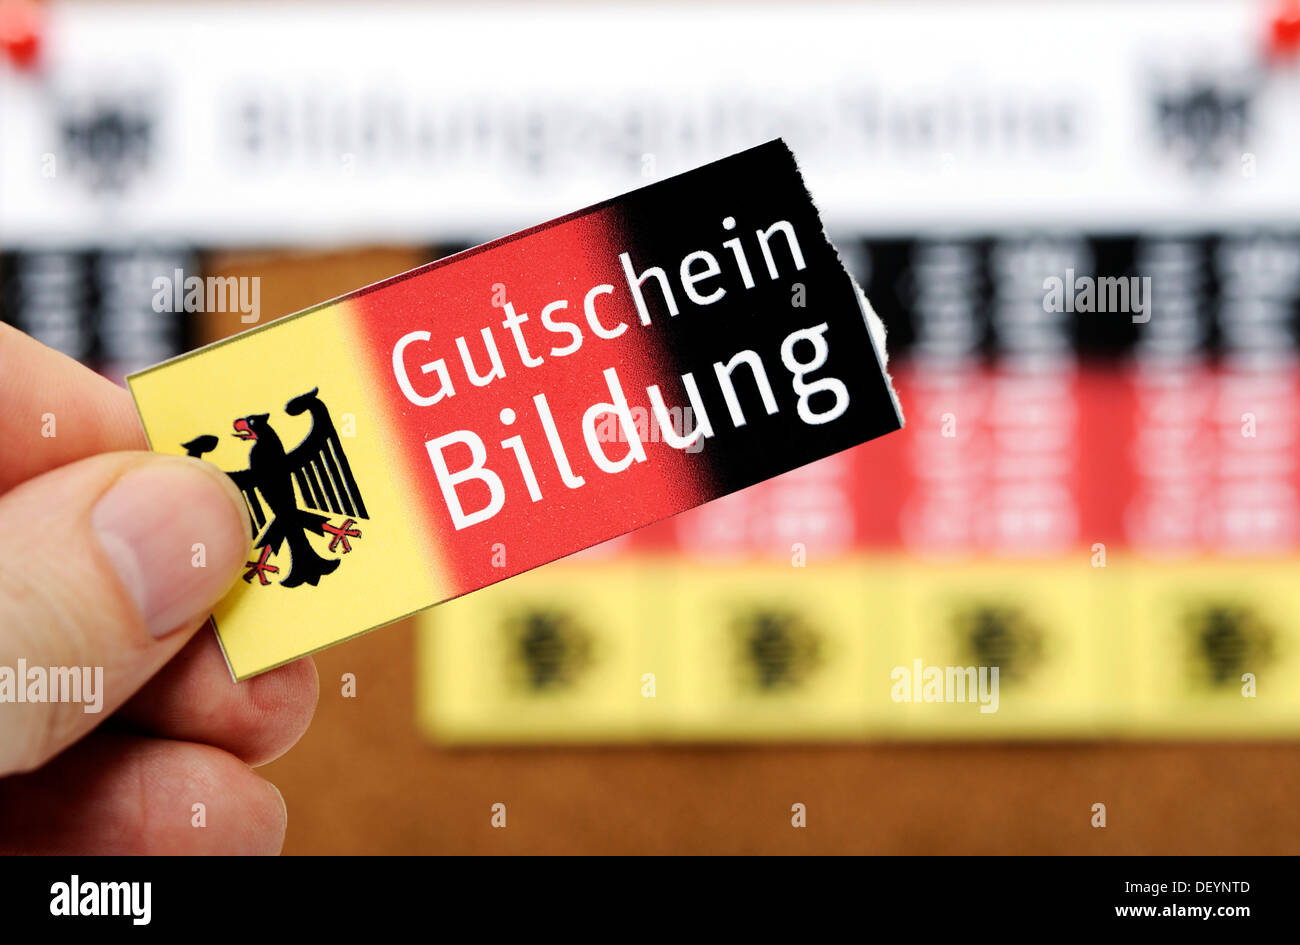 Vouchers on a noticeboard, lettering 'Bildungsgutscheine', German for 'education vouchers', symbolic image - Stock Image